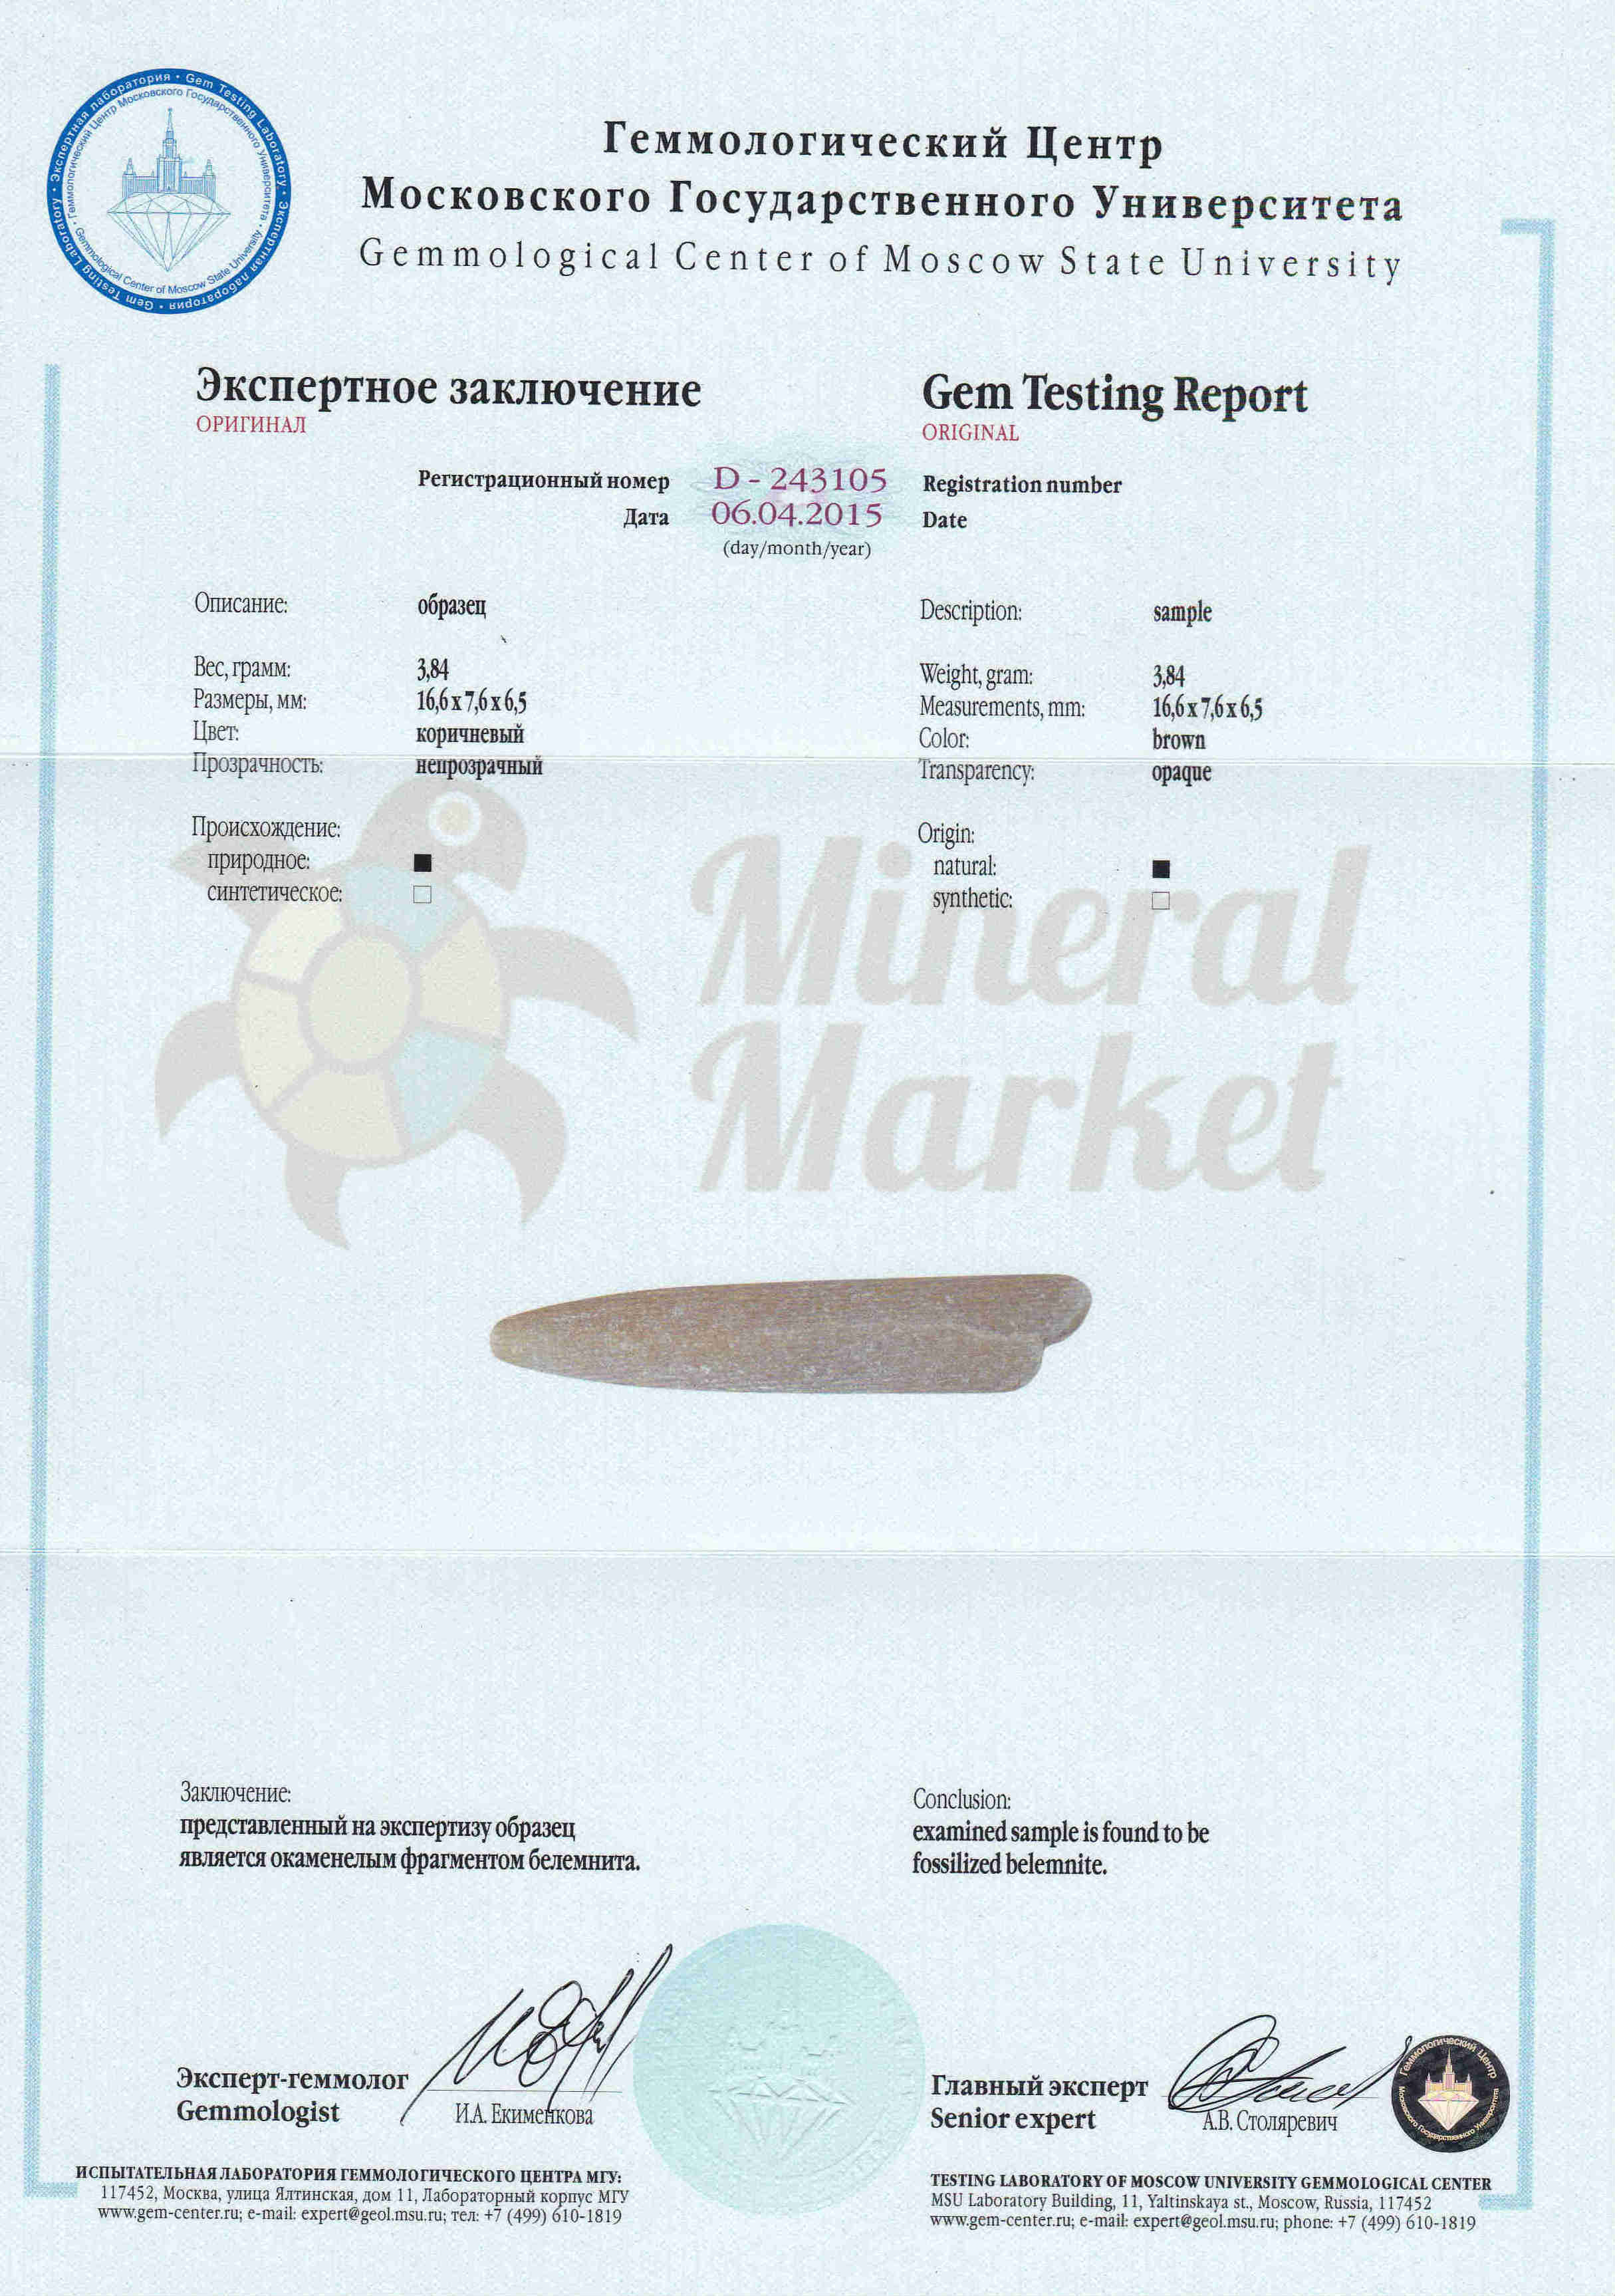 http://mineralmarket.ru/img/certificate/19.jpg